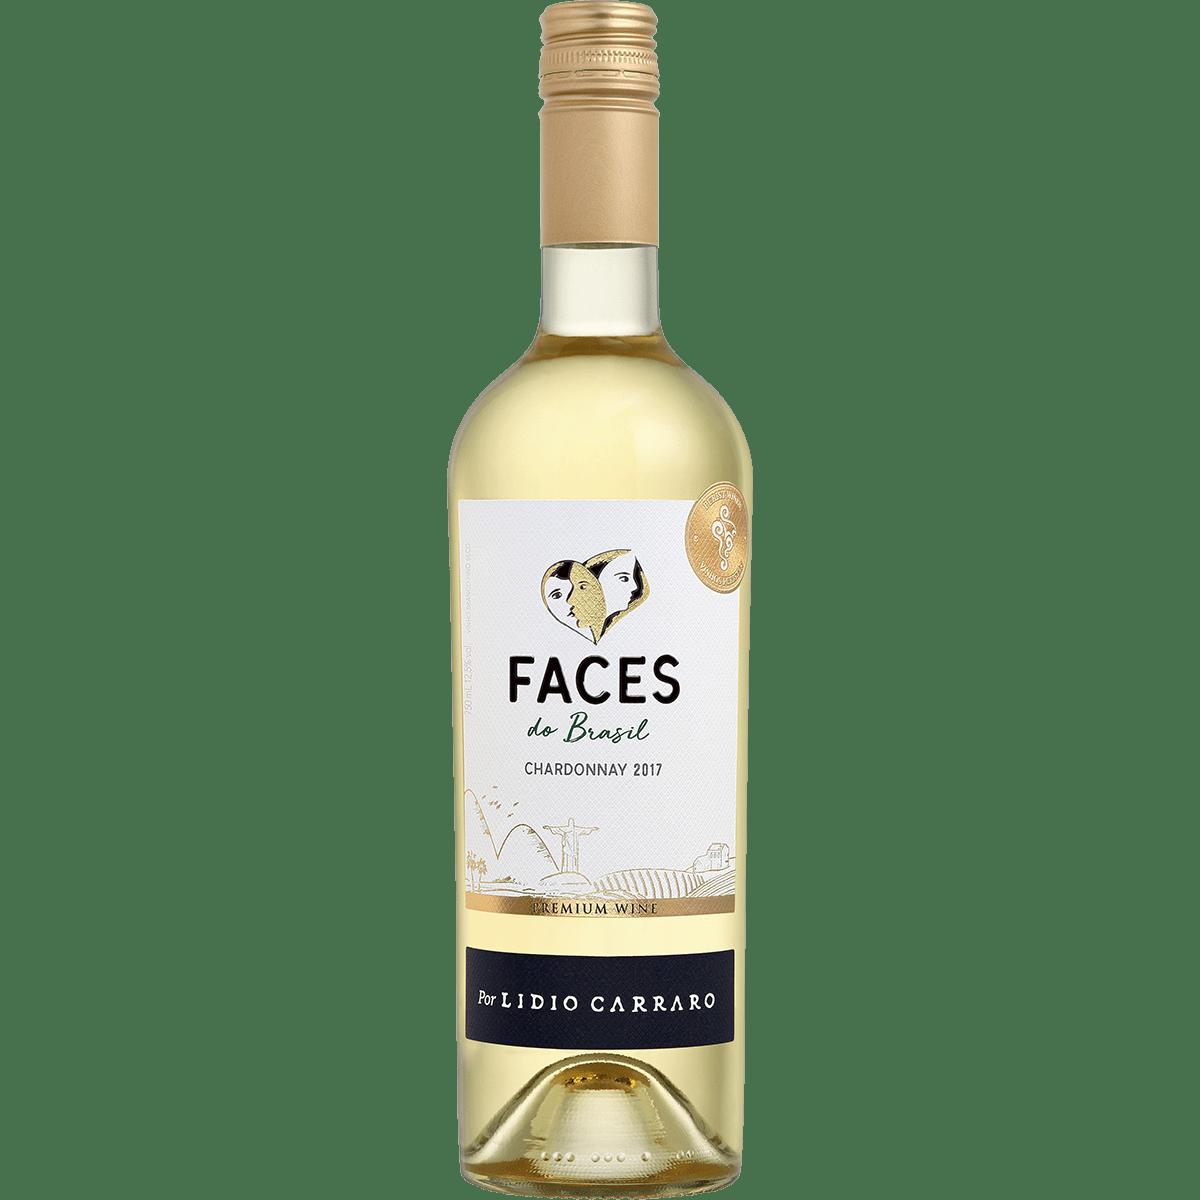 Vinho Lidio Carraro Faces do Brasil Chardonnay Branco Premium 750ml